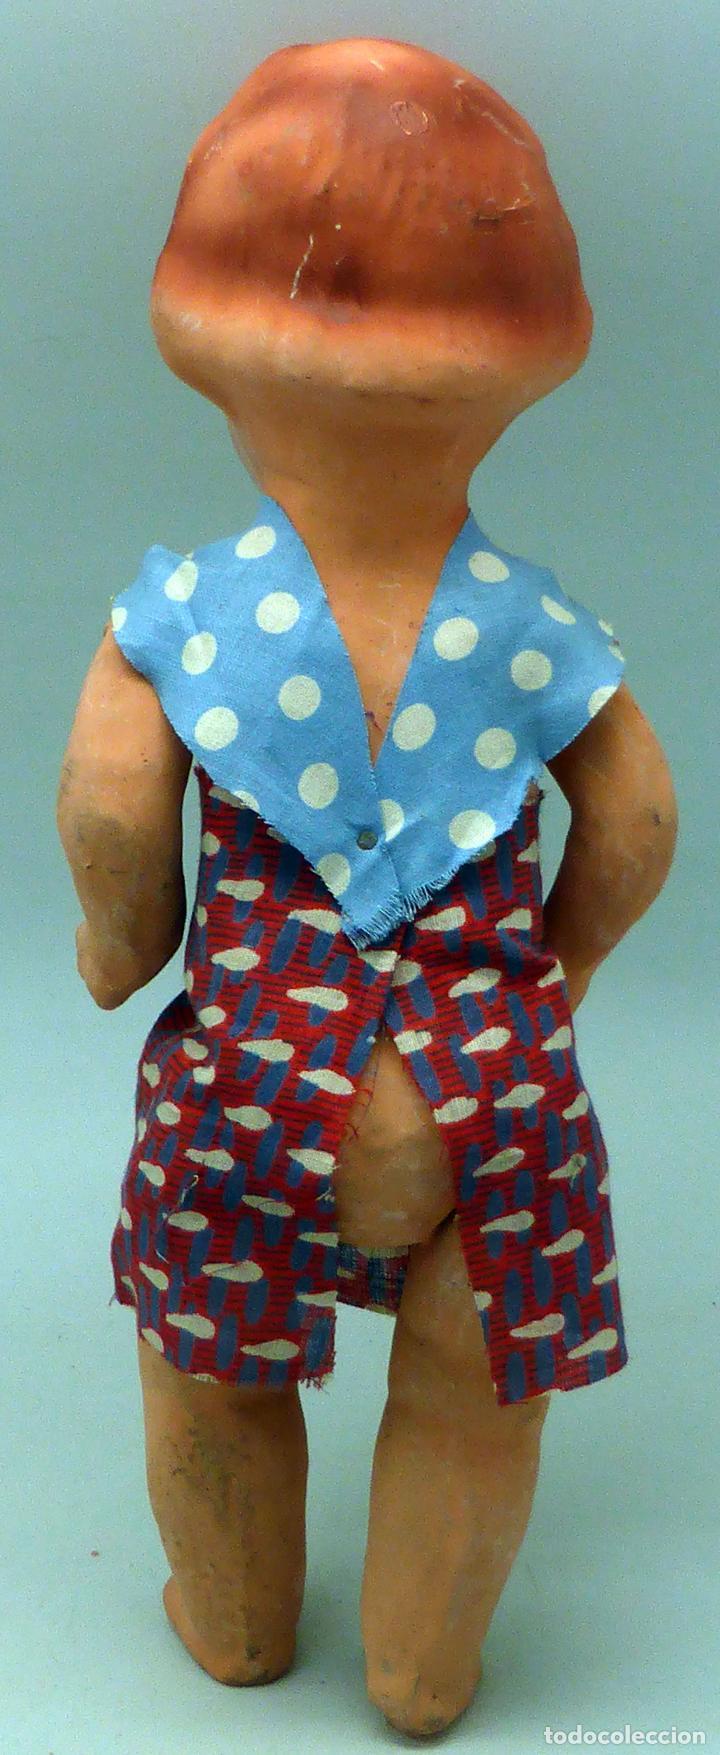 Muñeca española clasica: Pepona muñeca cartón piedra articulada ropa original años 30 - 40 32 cm alto - Foto 3 - 102609831